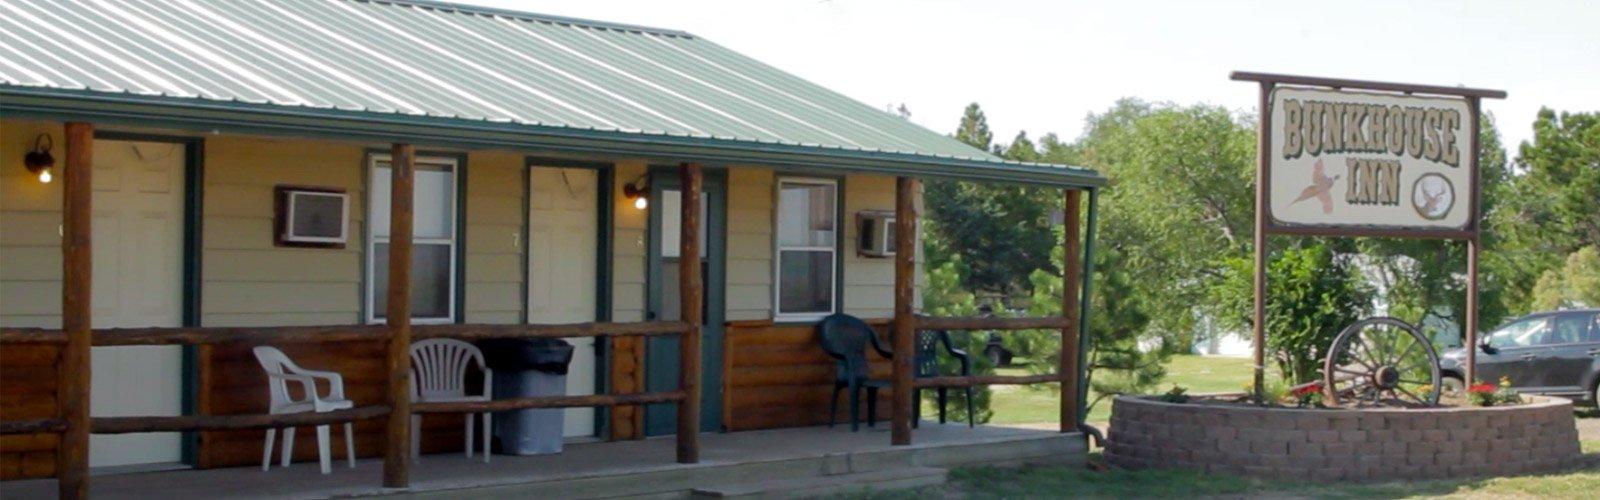 Bunkhouse Inn